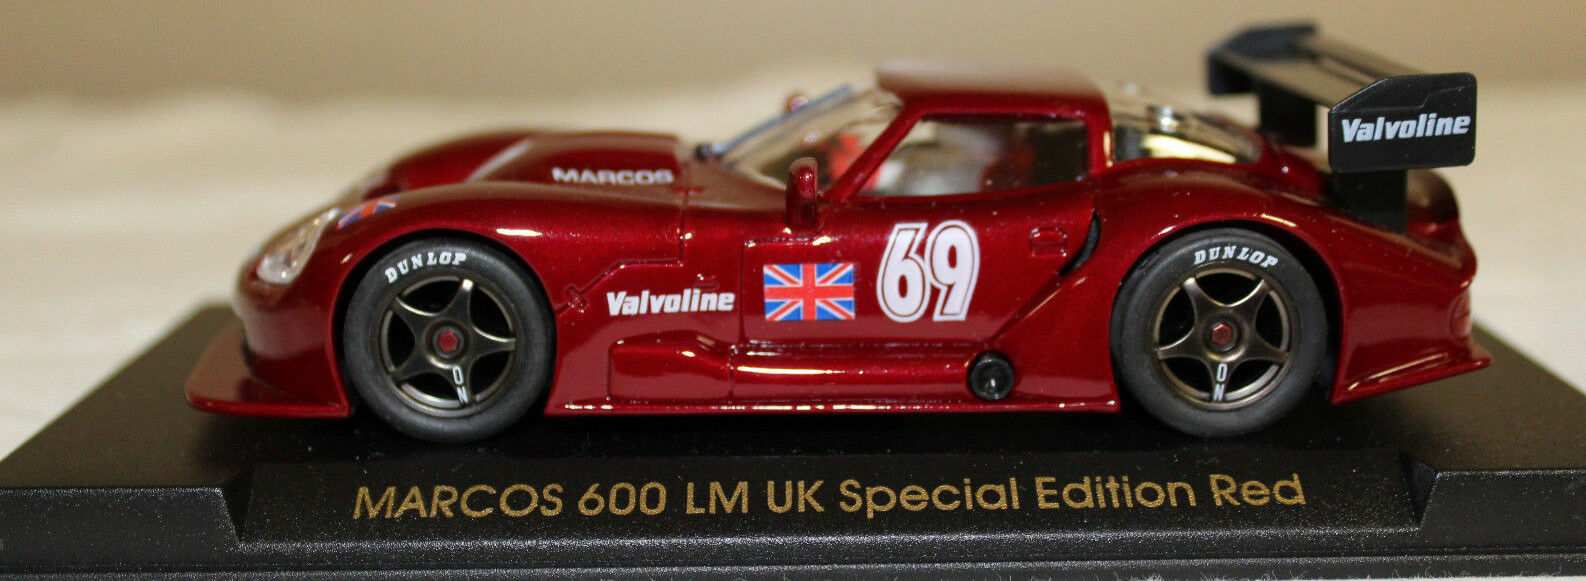 NIB Sällsynta flygaga MARCOS 600 LM UK särskild Edition röd 1 32 Slot bil